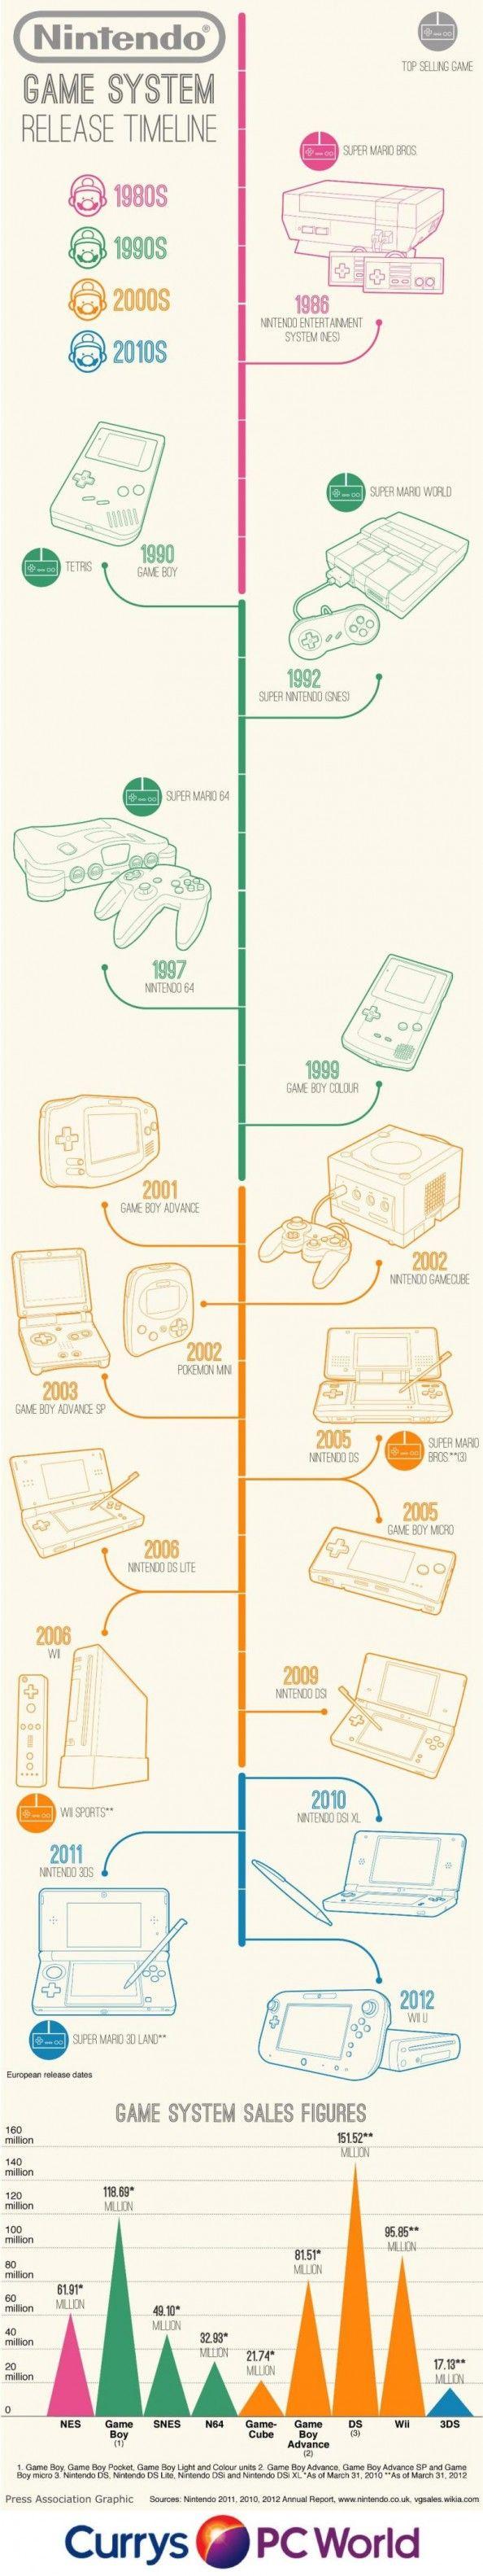 Nintendo release timeline